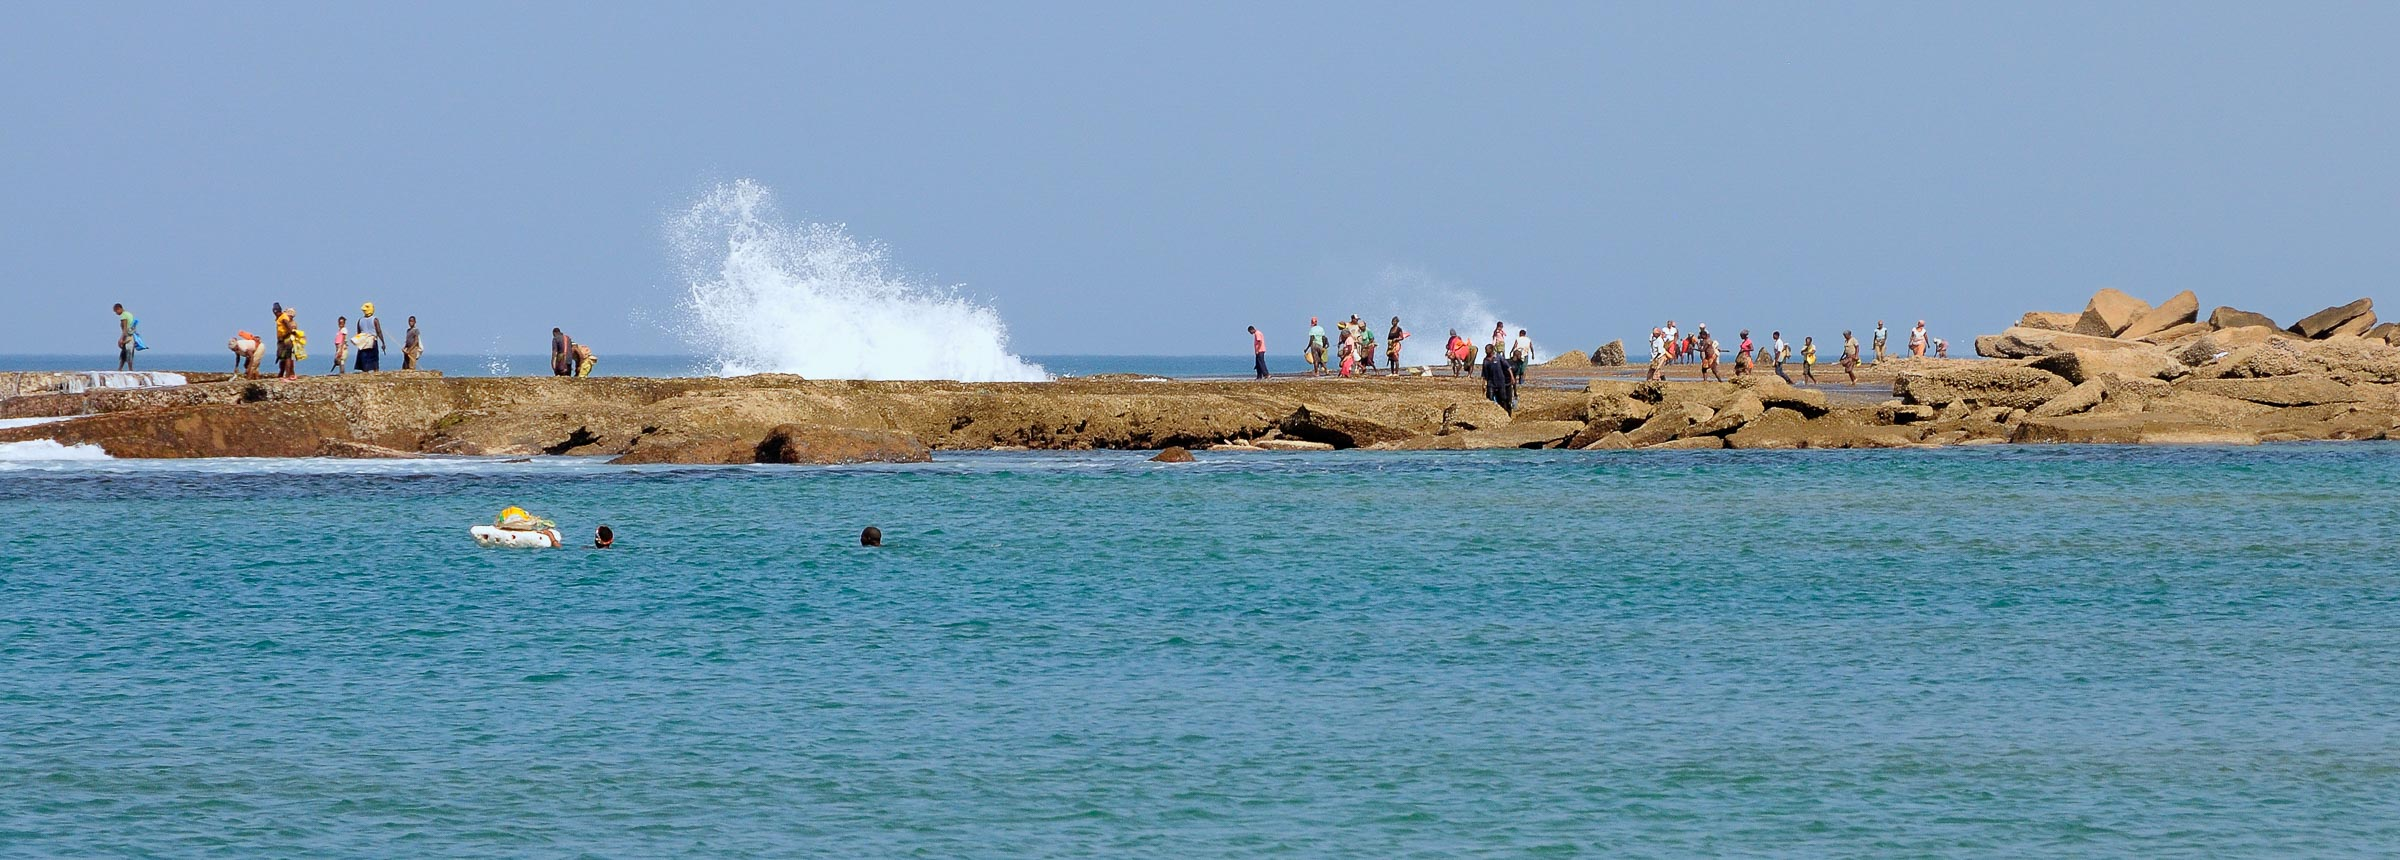 Locals harvesting shellfish from rocks at Xai Xai beach